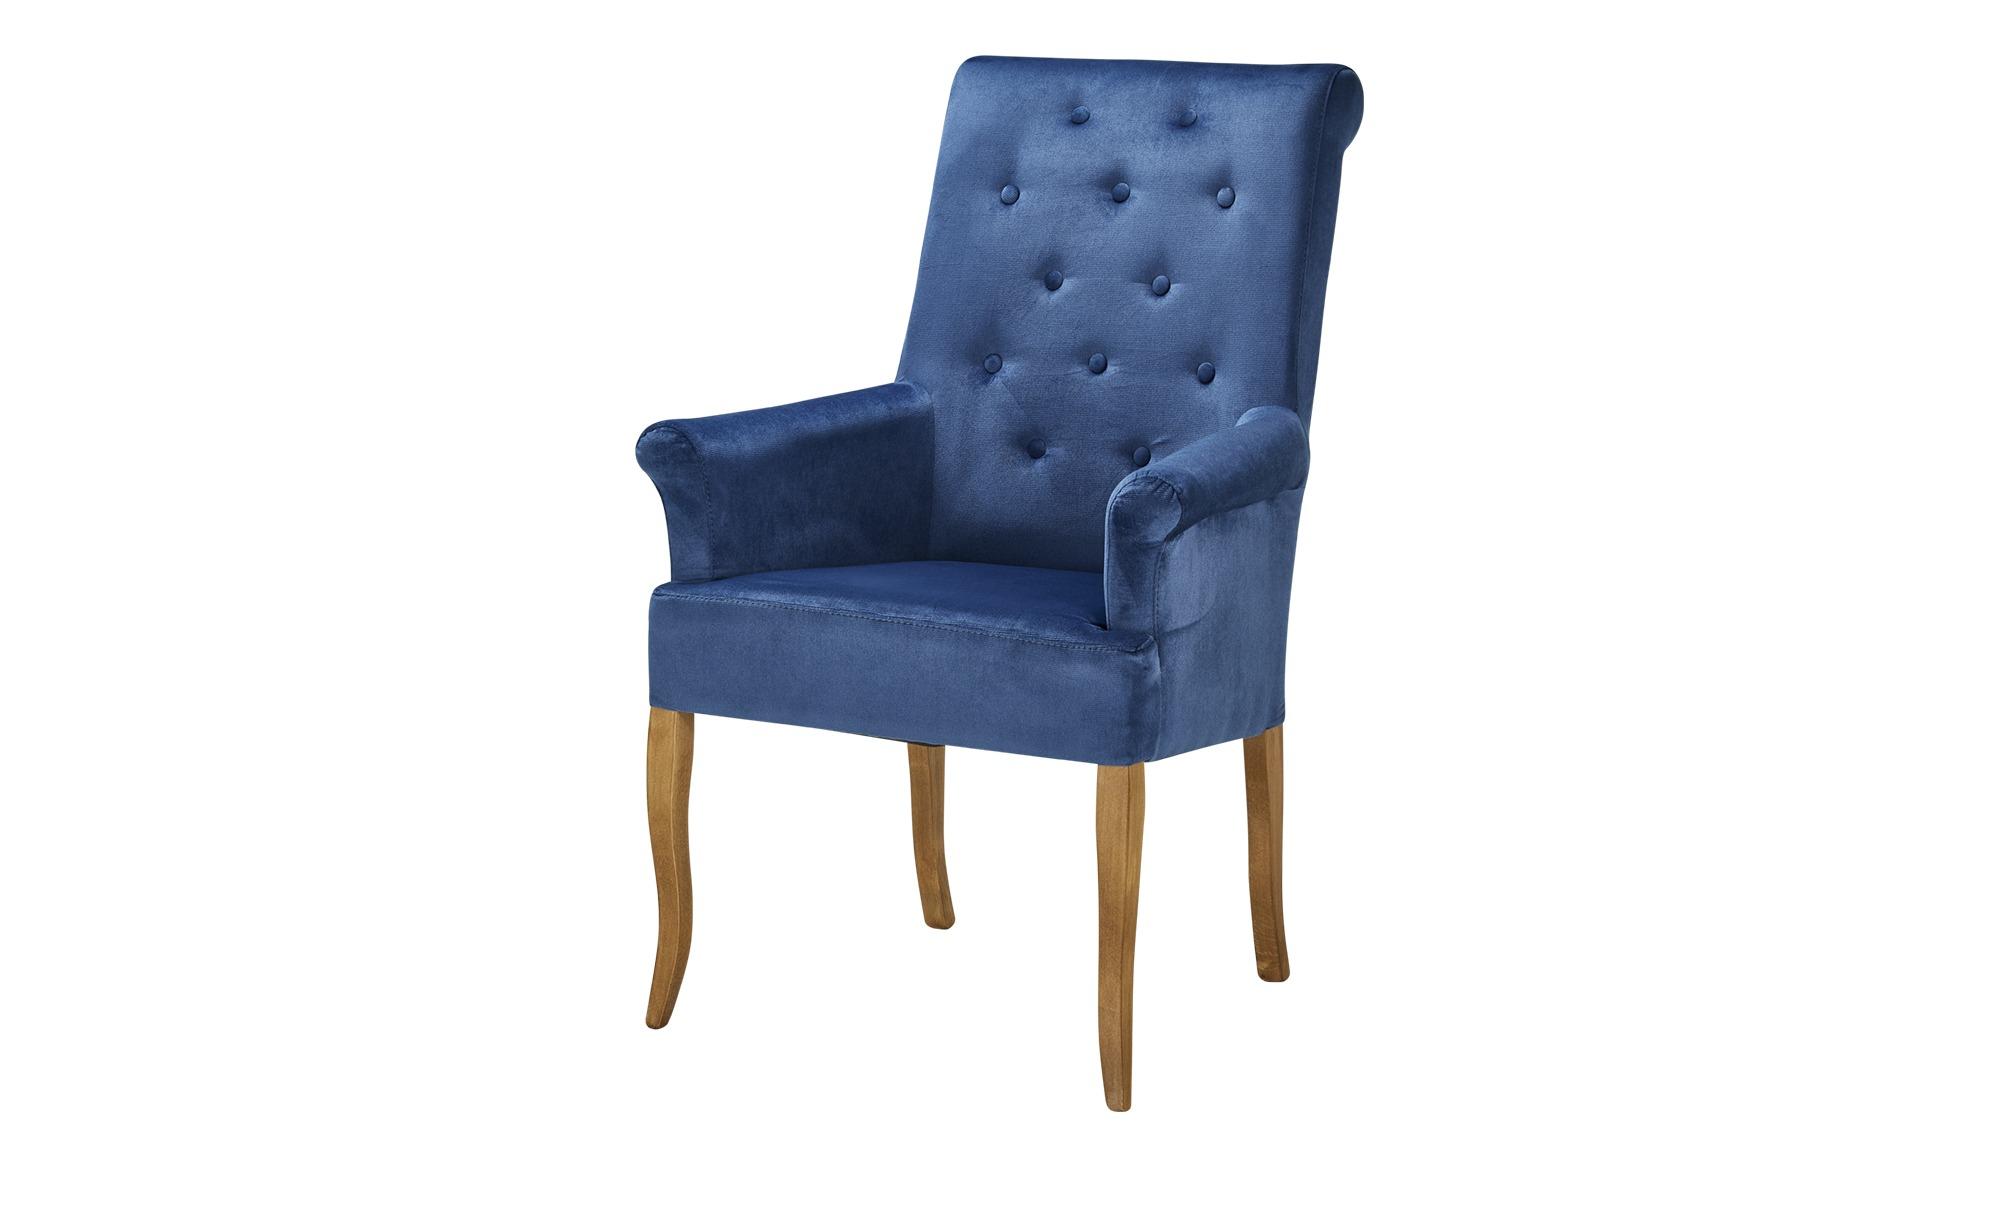 smart Polsterstuhl  Nora ¦ blau Stühle > Esszimmerstühle > Esszimmerstühle mit Armlehnen - Höffner